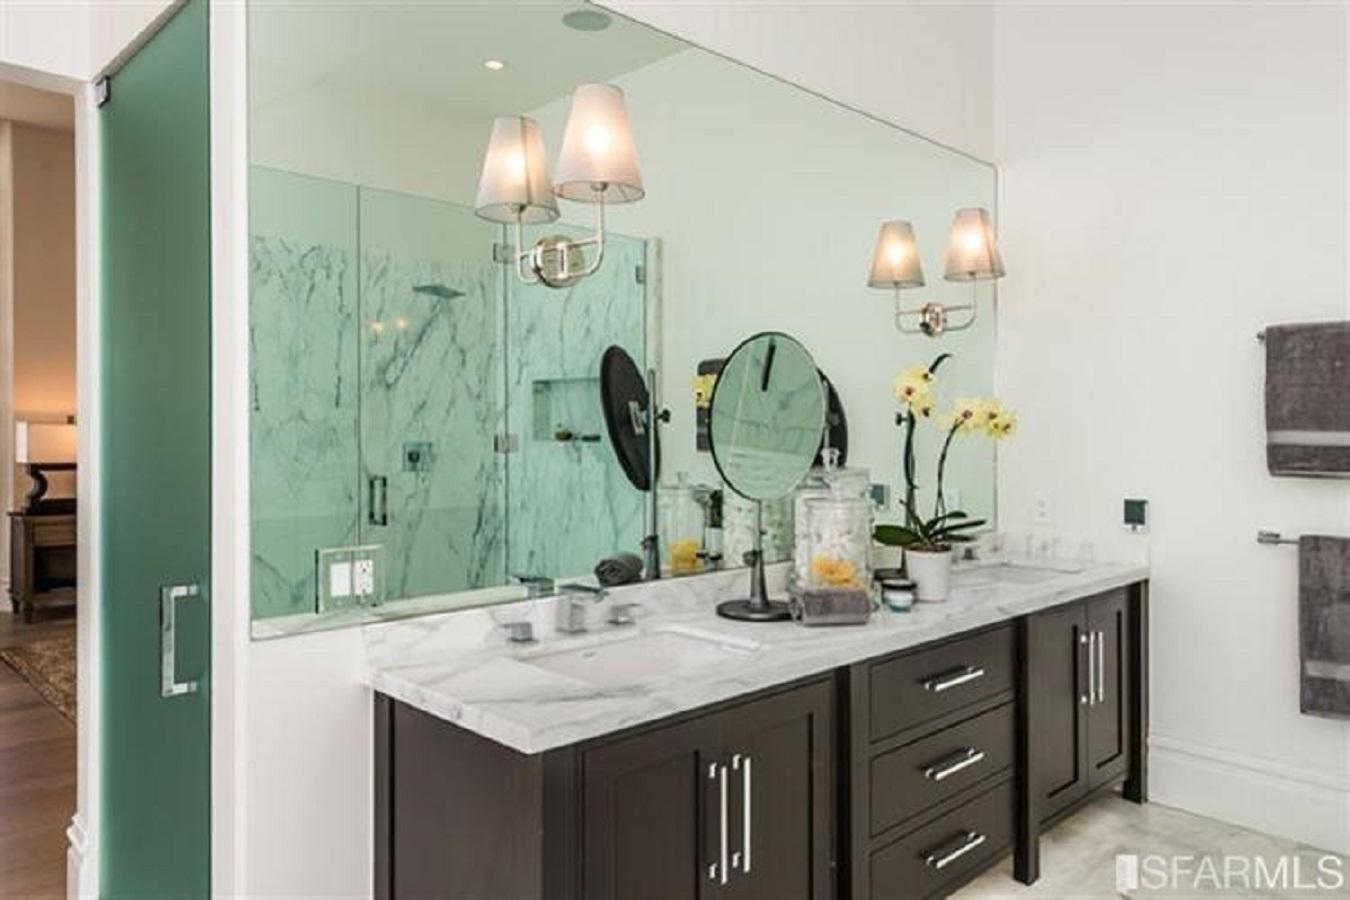 Common Bathroom Design Mistakes To Avoid Modernize